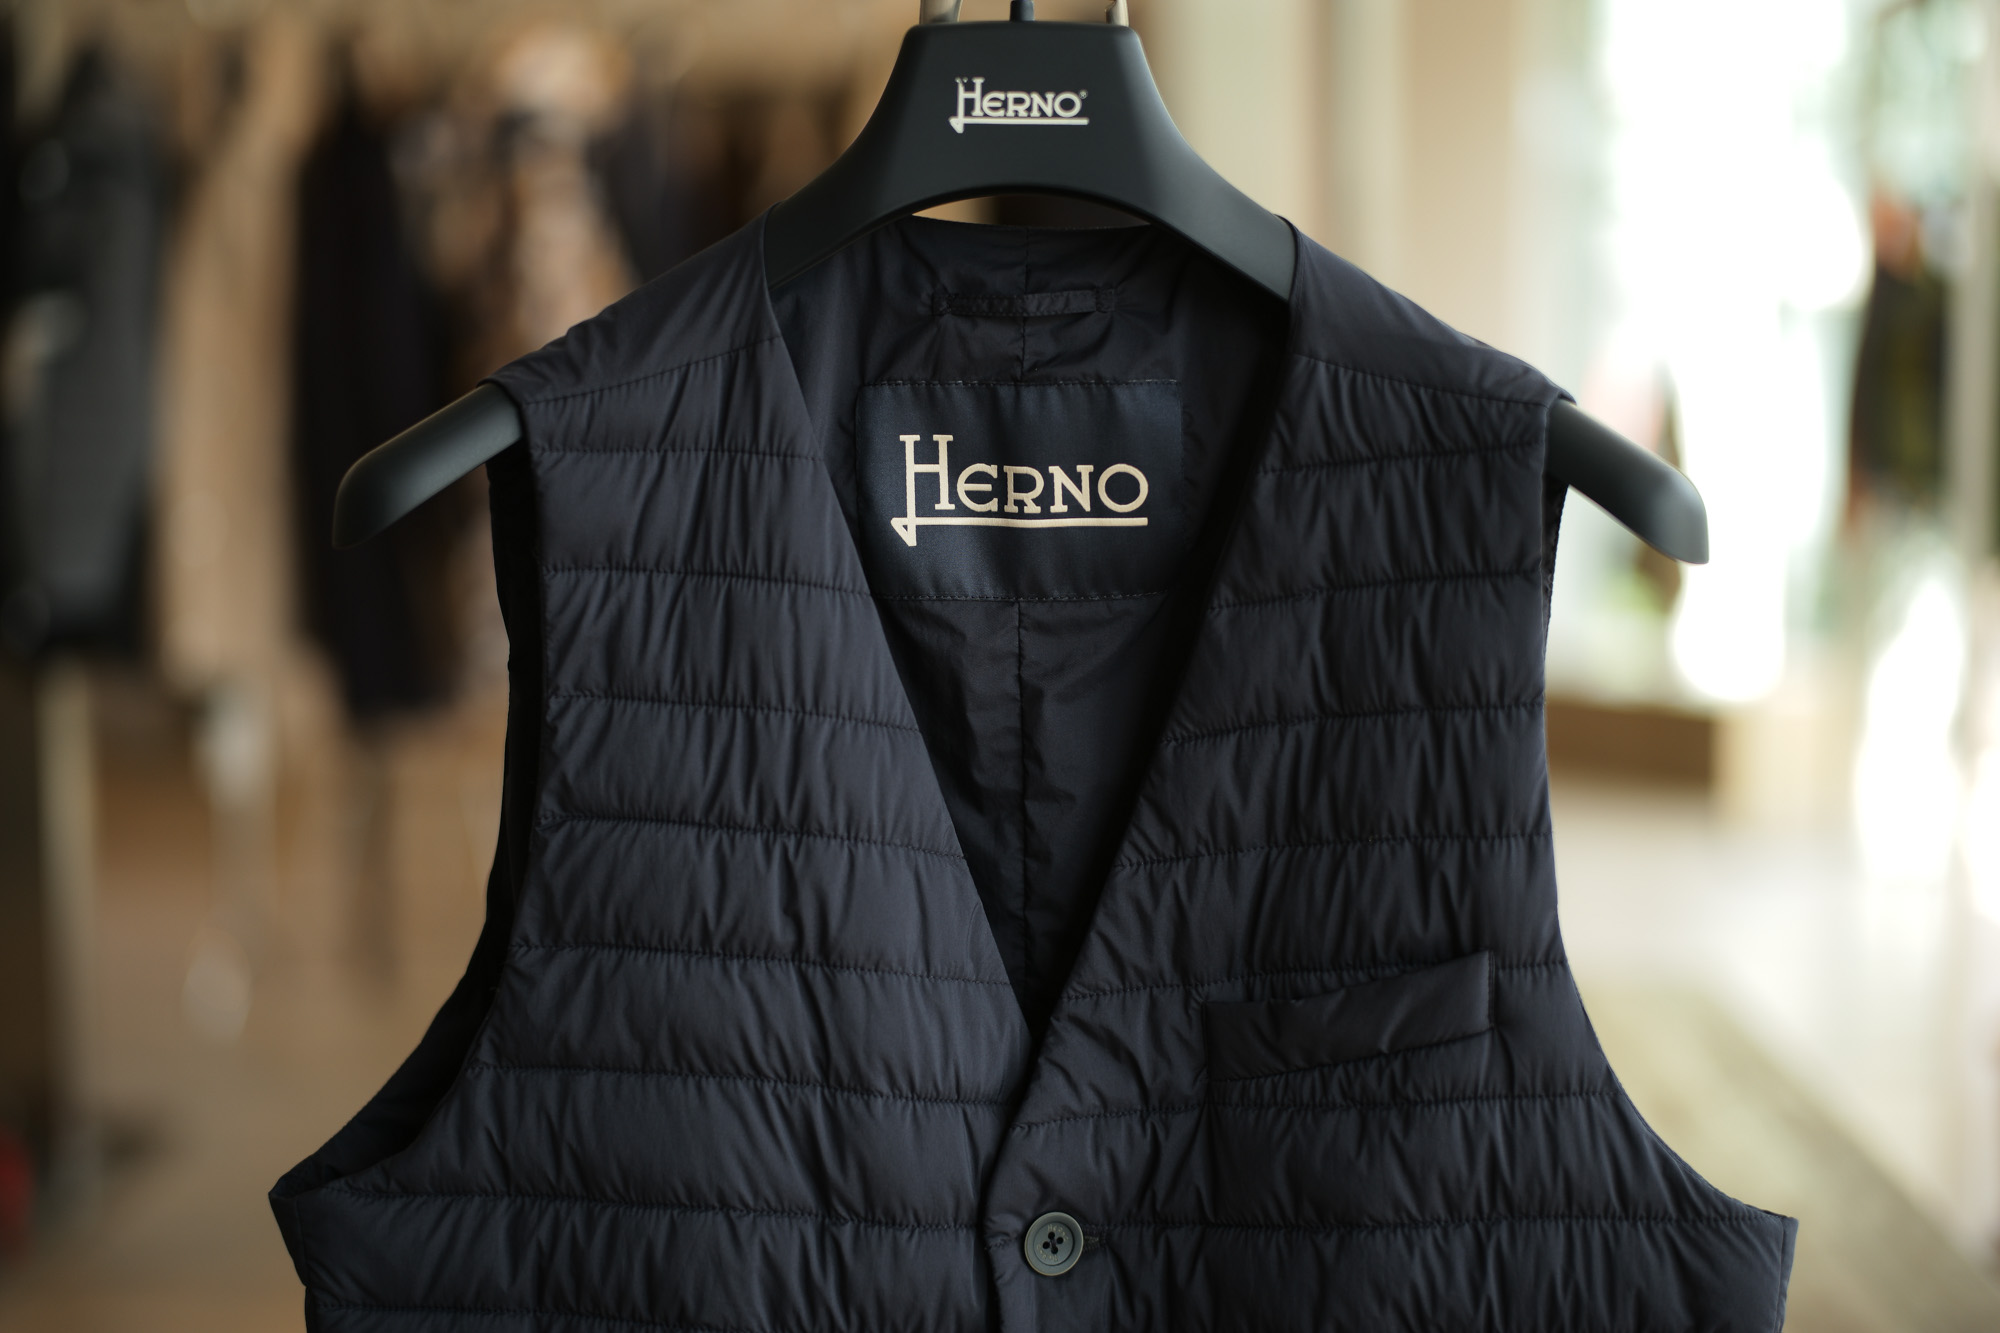 HERNO / ヘルノ (2018 春夏 展示会)  herno ヘルノ 愛知 名古屋 ZODIAC ゾディアック ラミナー シェル コート ジャケット トレンチコート ダウンベスト  PC0039U GA0069U GA008UL GI028UL IM0127U